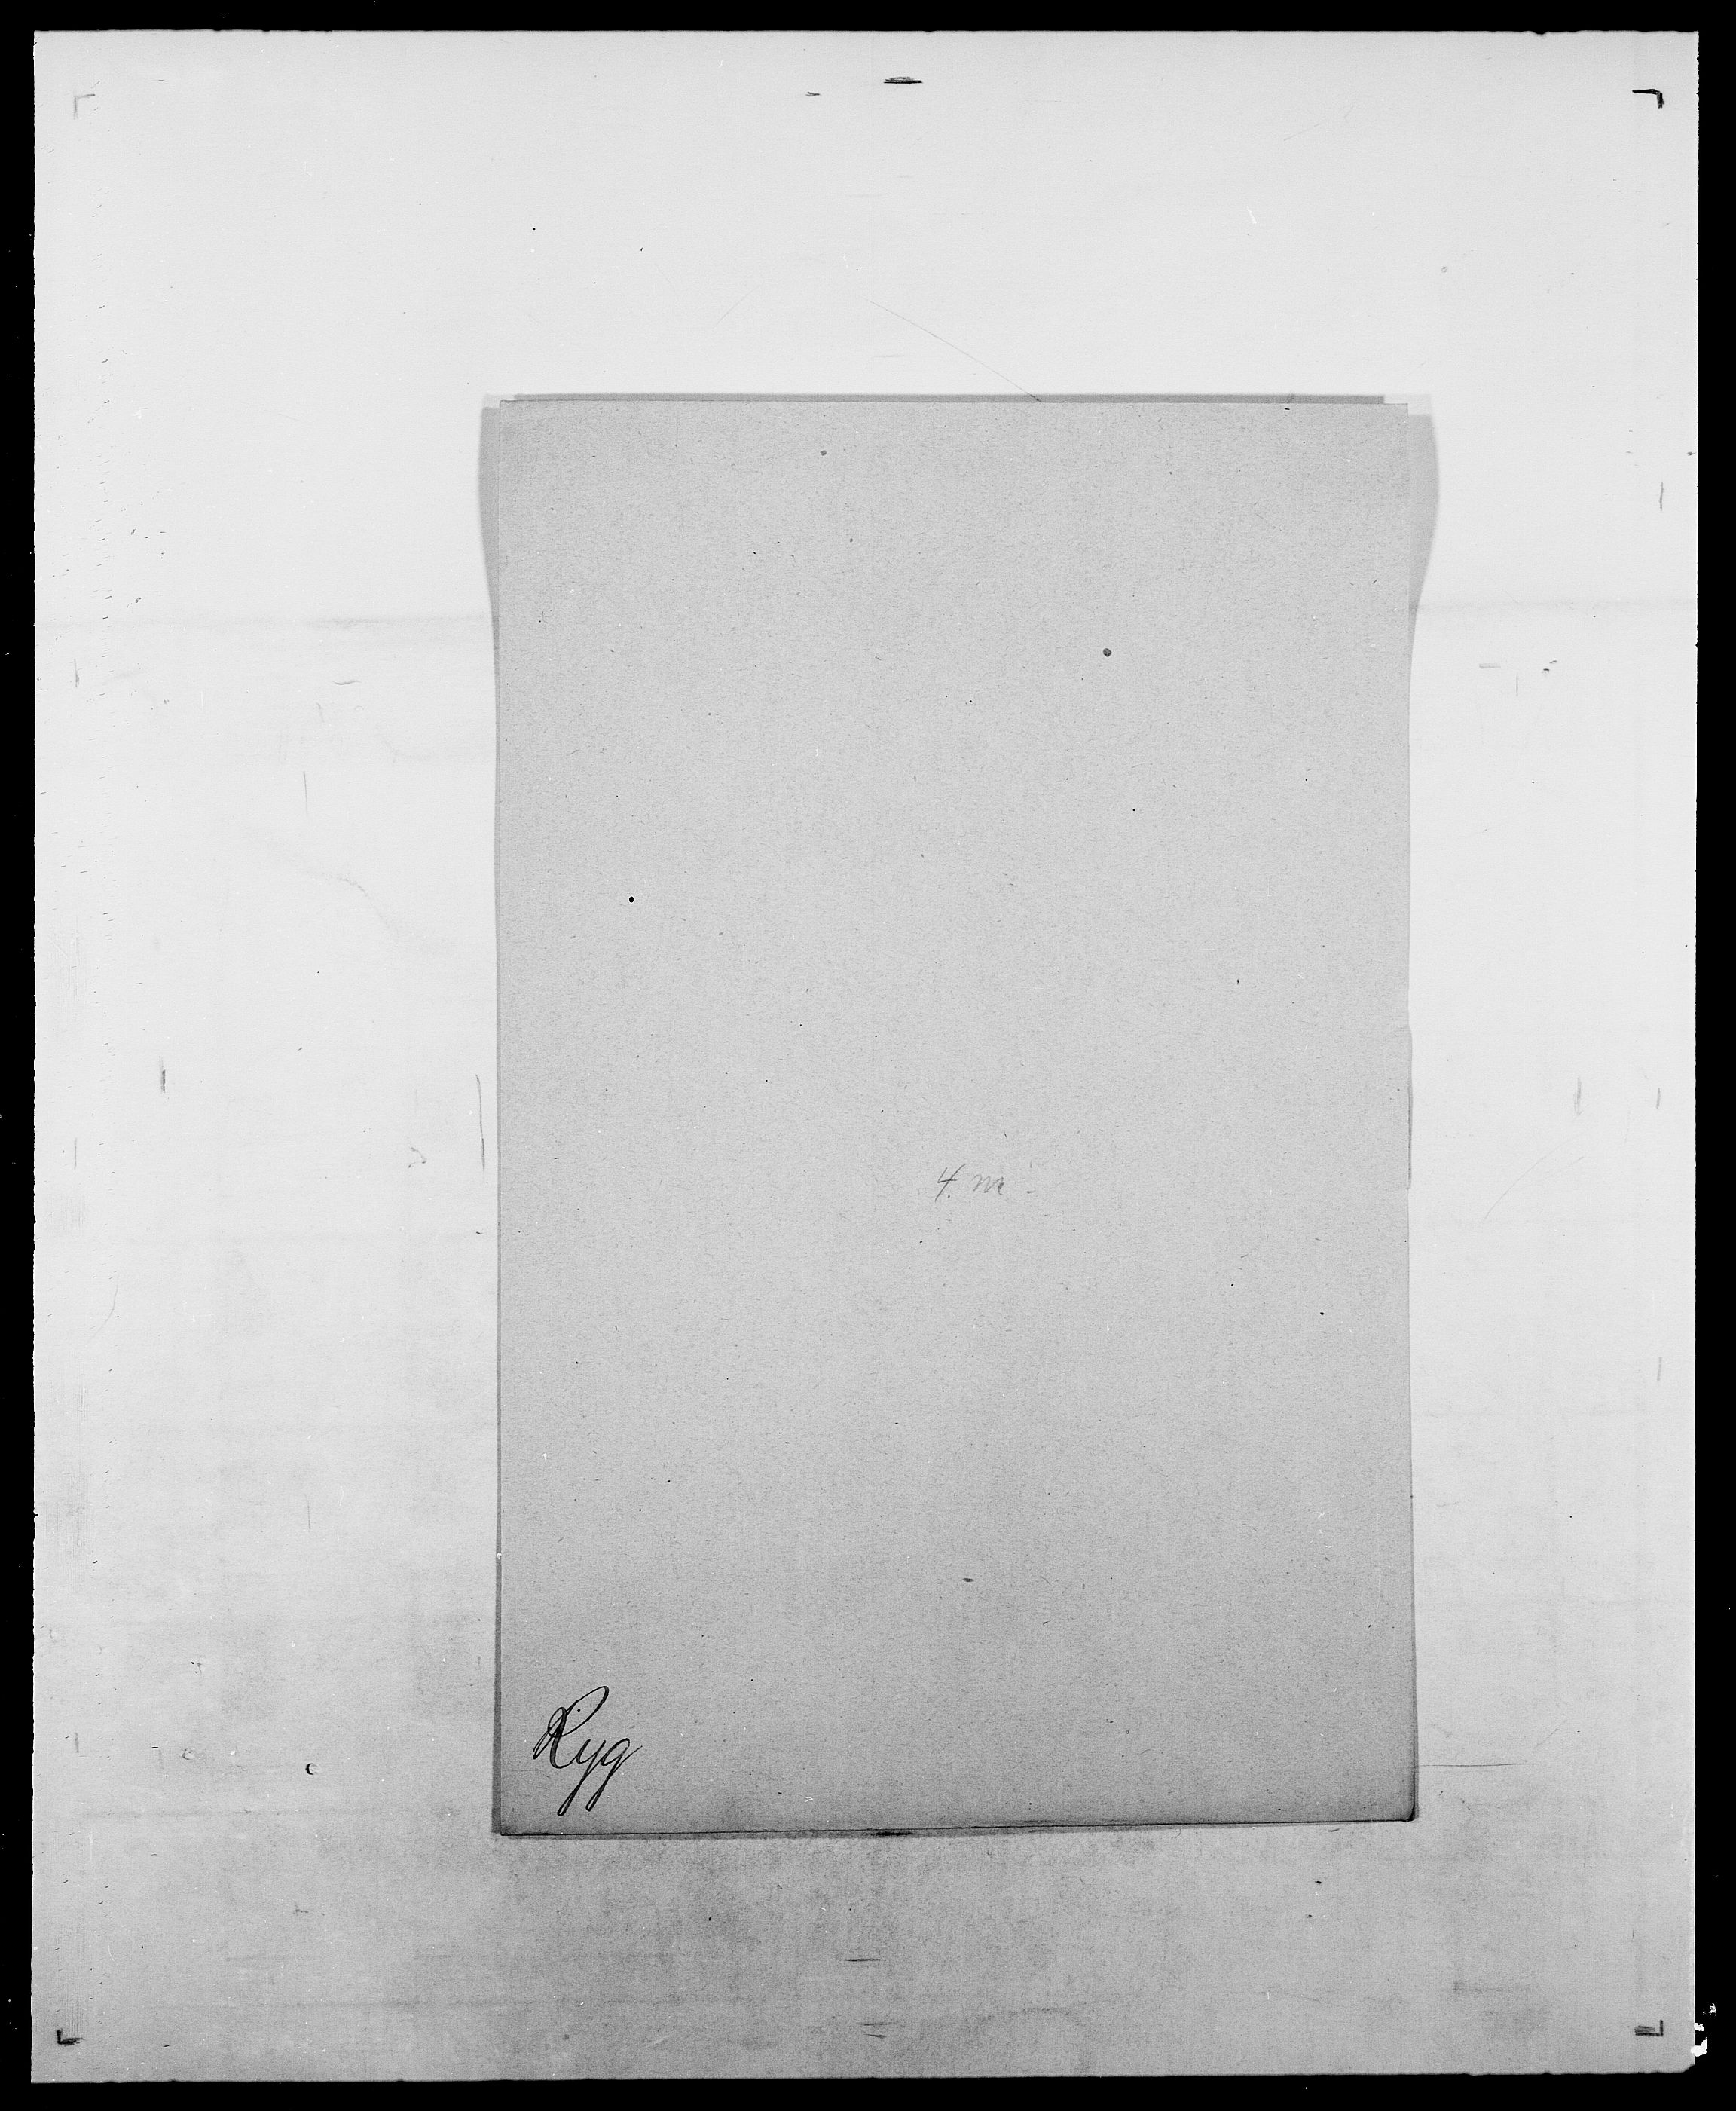 SAO, Delgobe, Charles Antoine - samling, D/Da/L0033: Roald - Røyem, s. 551